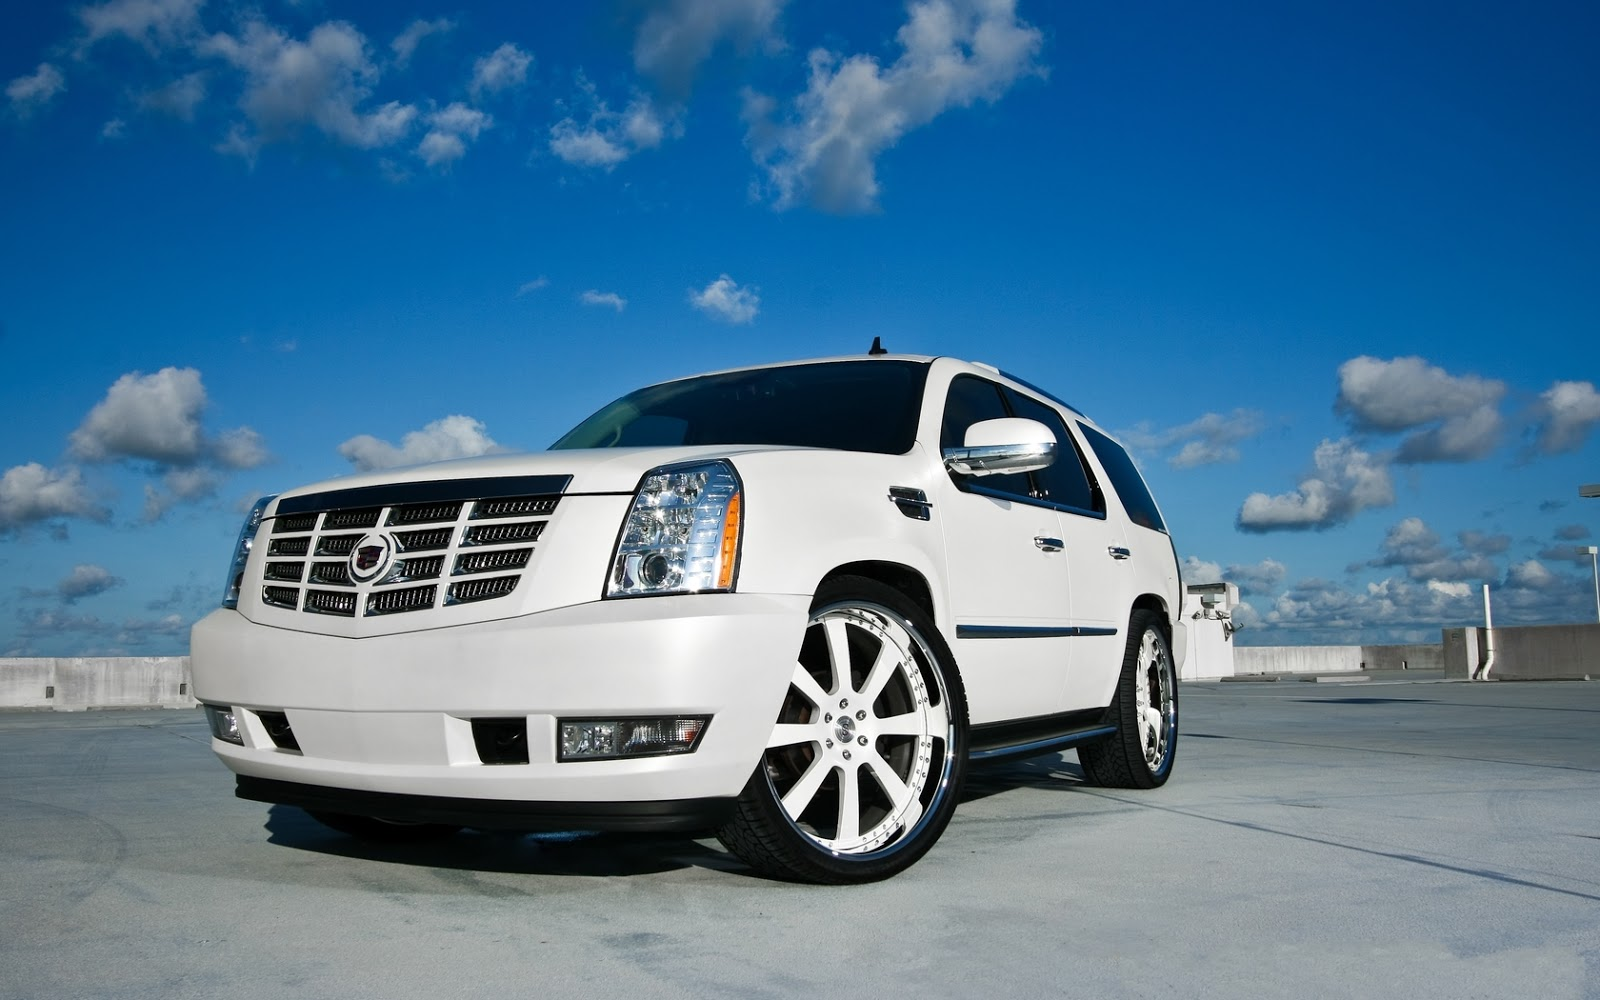 http://4.bp.blogspot.com/-W7diwxS89e8/UNXFW5fSZmI/AAAAAAAAAE8/k5NeEgqwEF0/s1600/Cadillac+Escalade+Wallpaper+HD.jpg